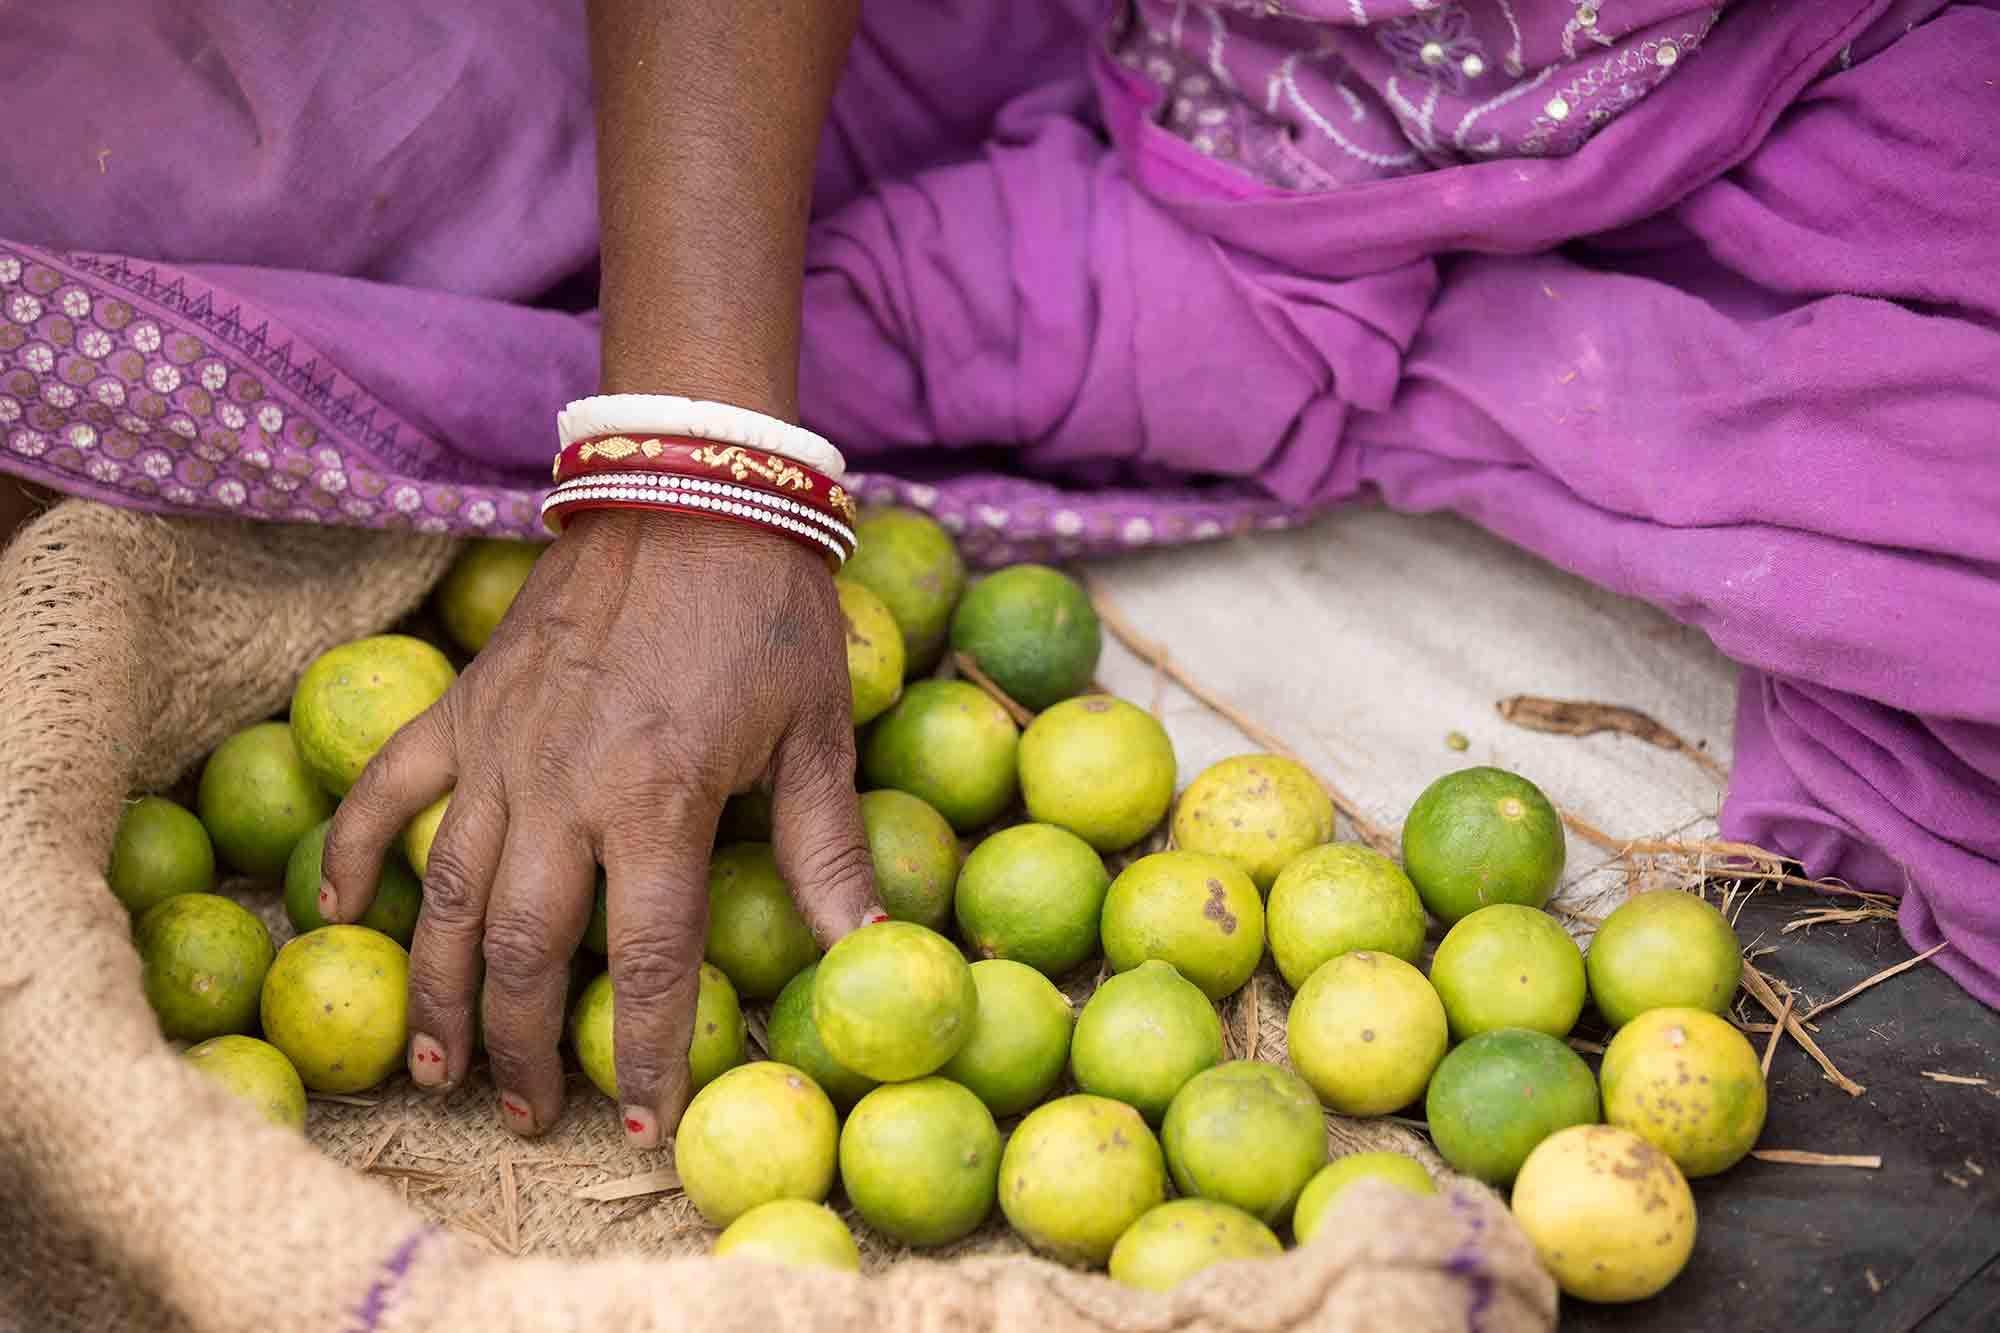 hands-market-woman-limes-kolkata-india